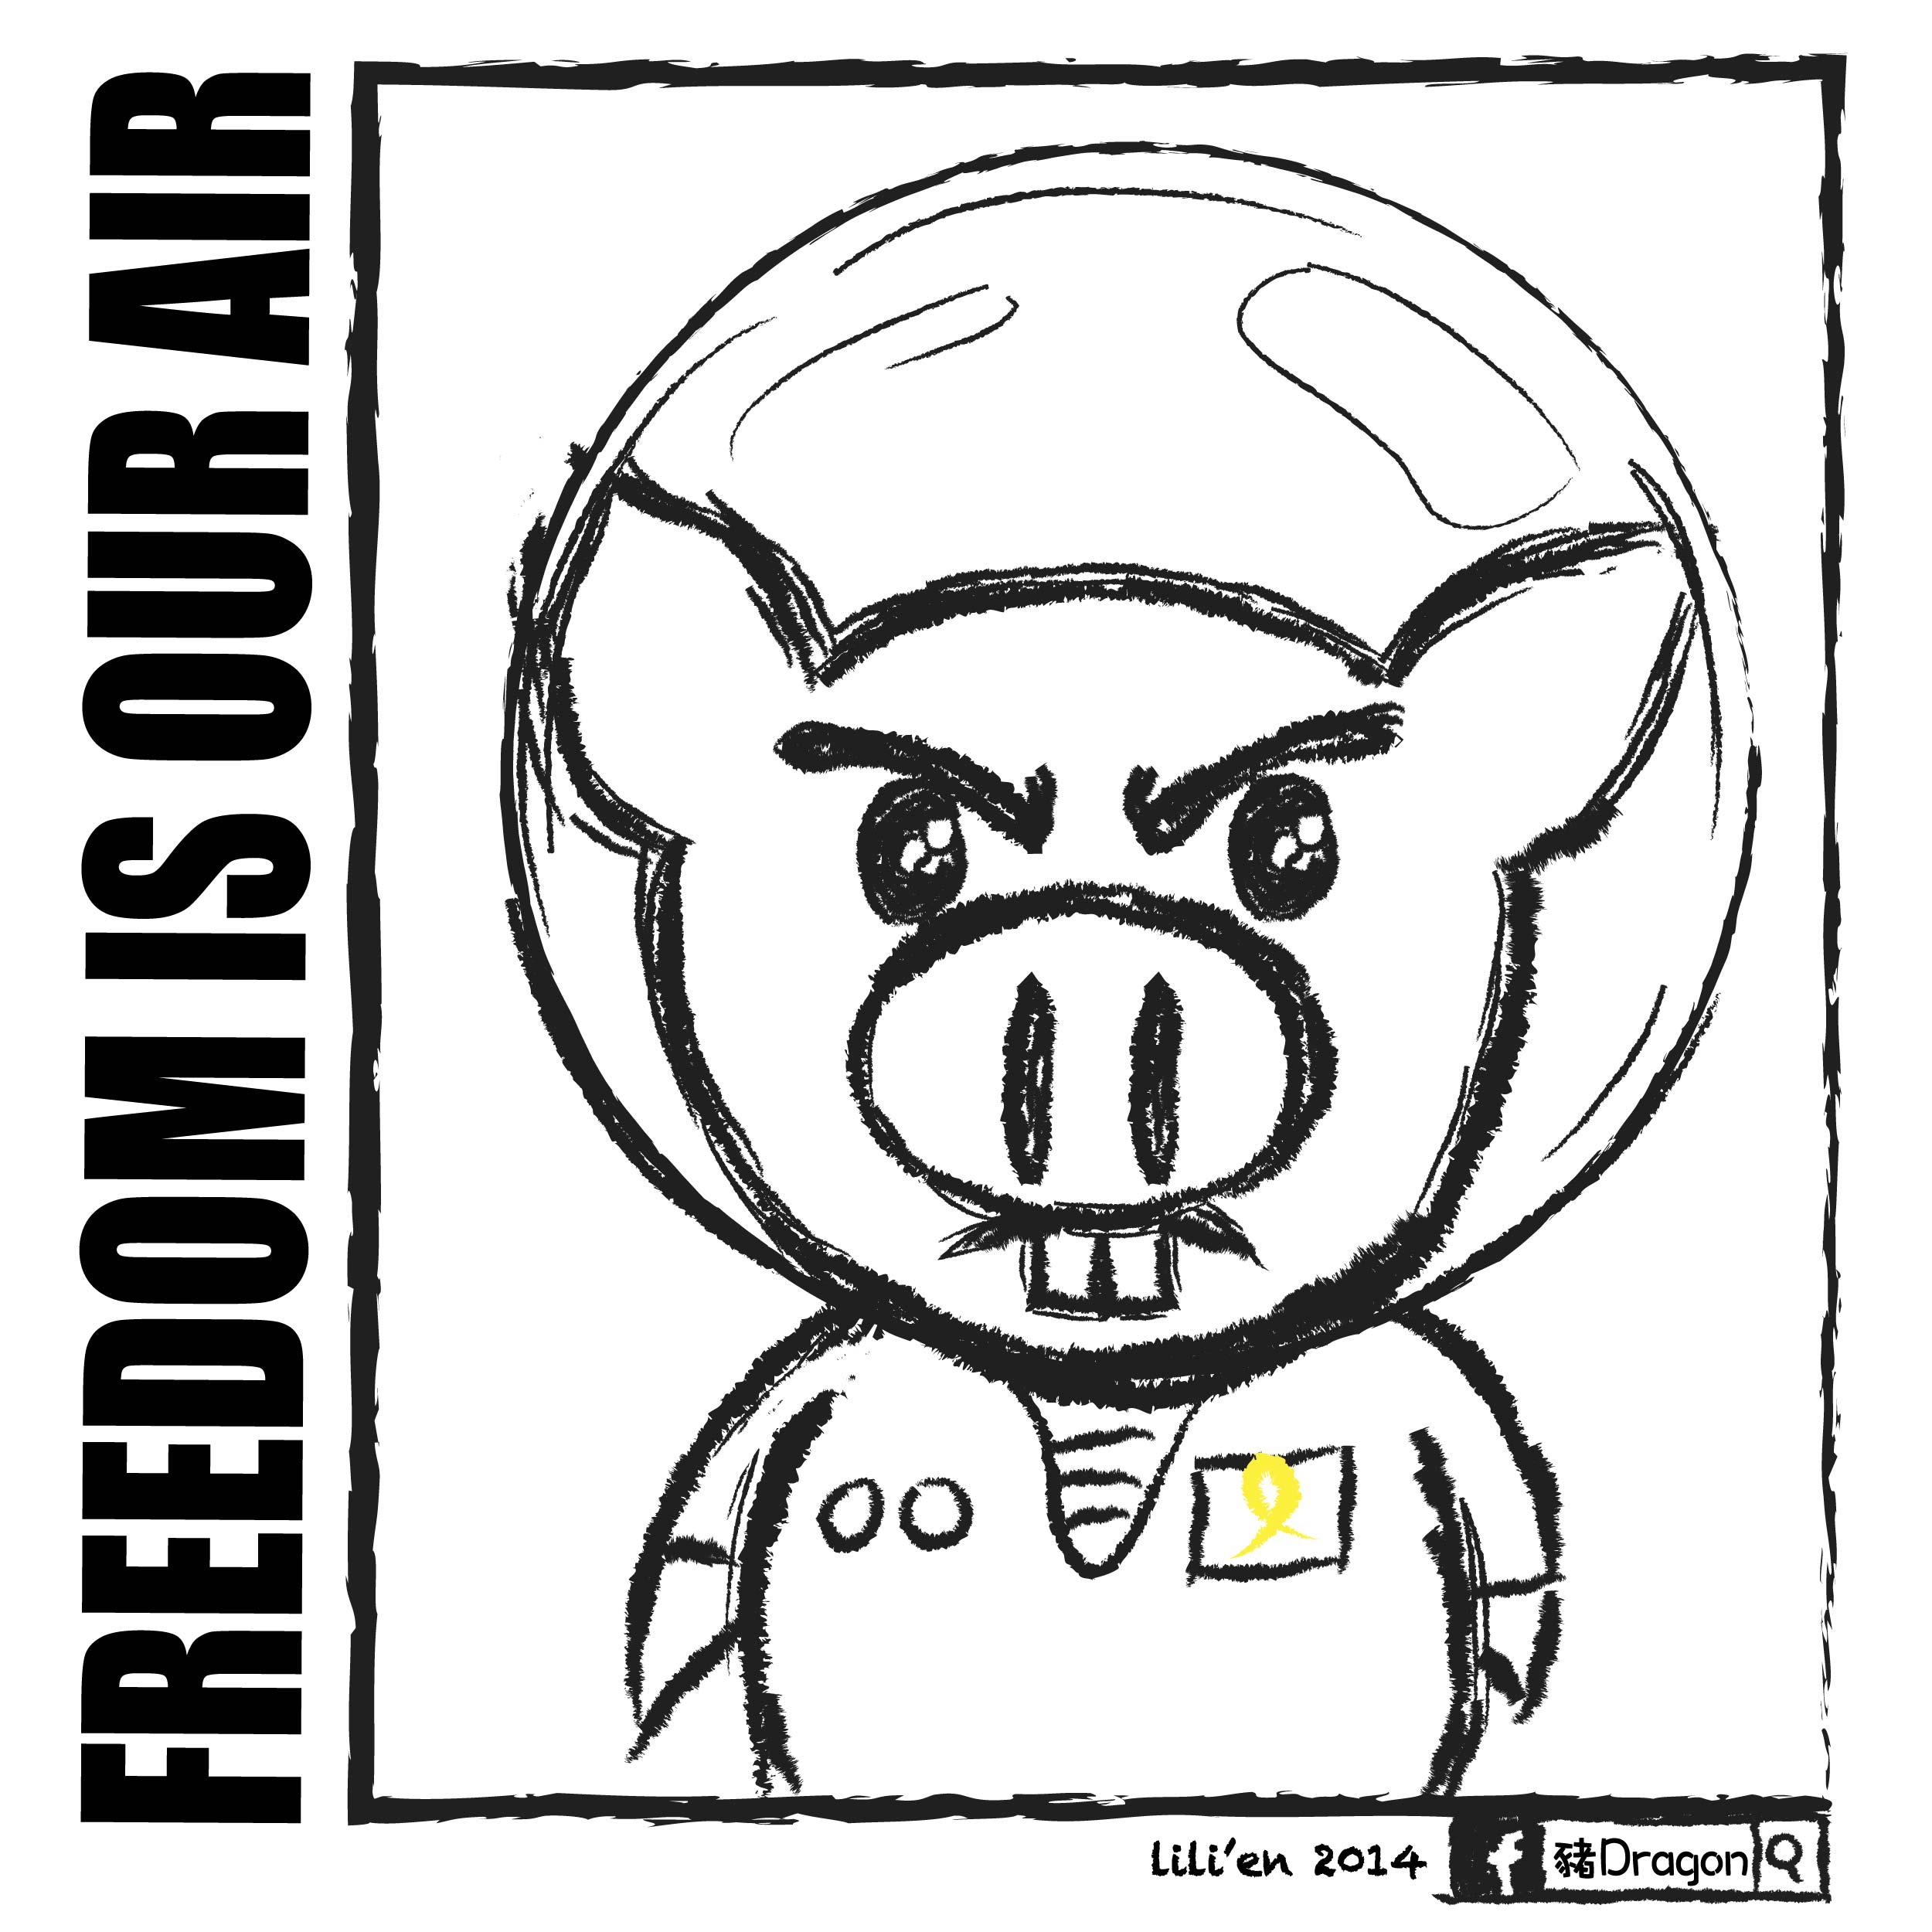 freedomisair-01.jpg